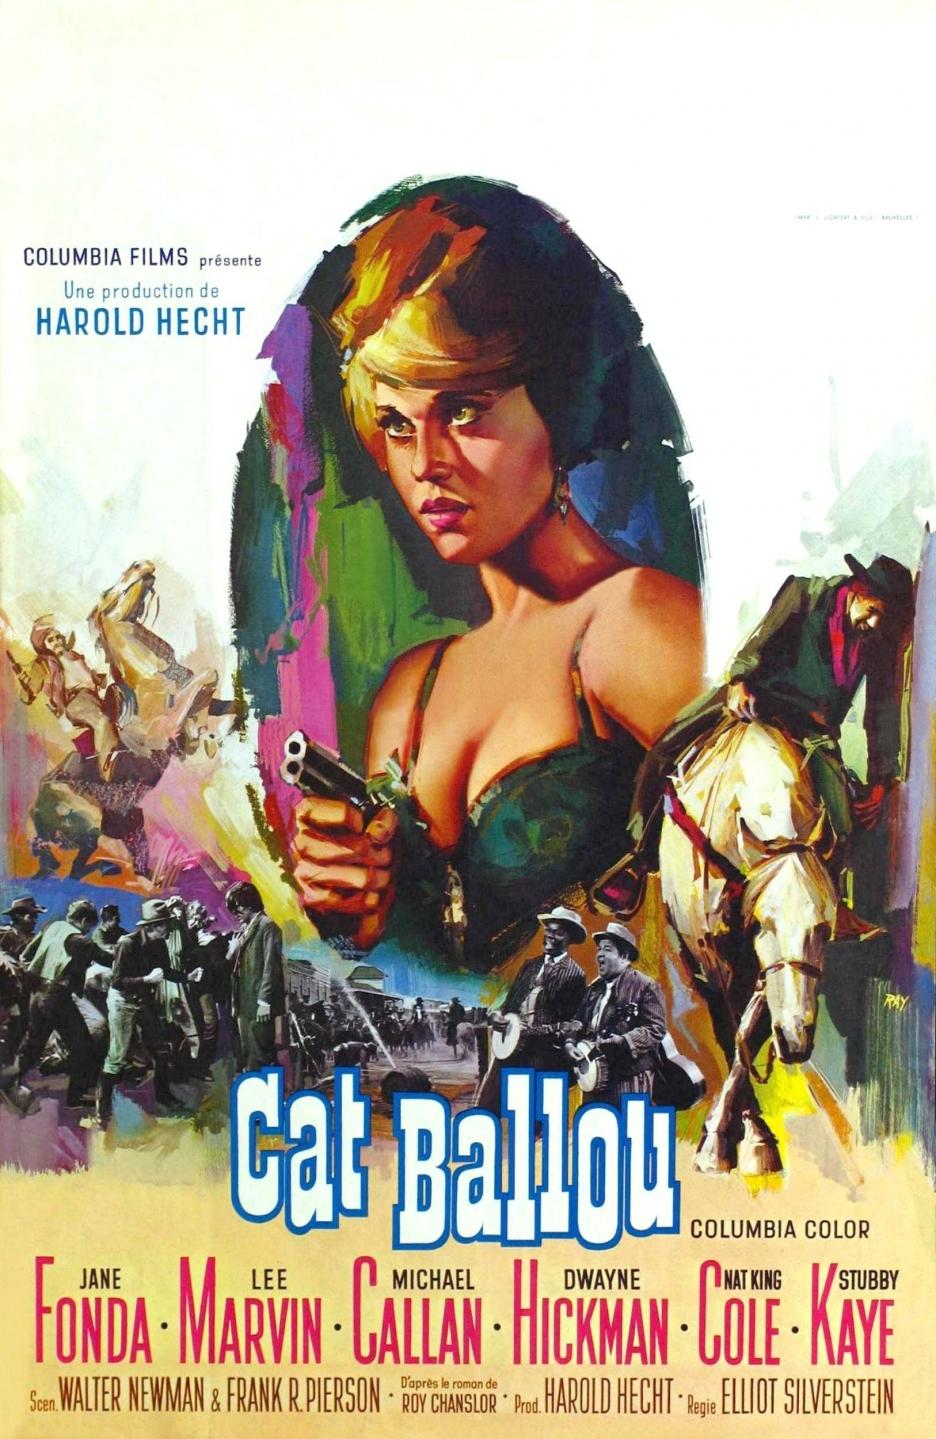 Cat Ballou Film